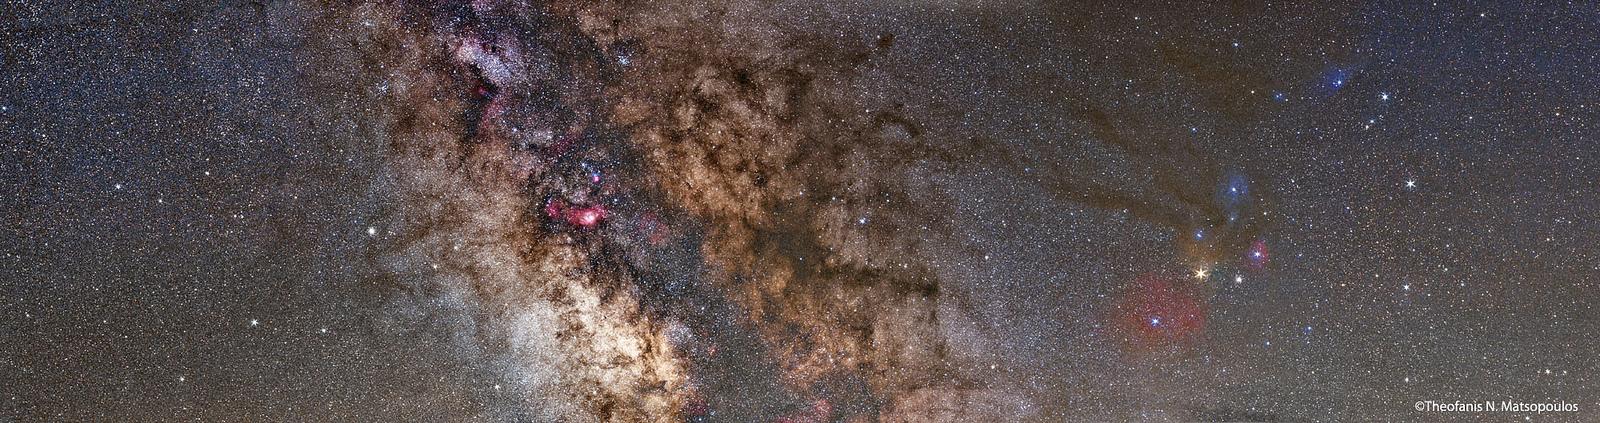 Scorpius Sagittarius Mosaic by Theofanis